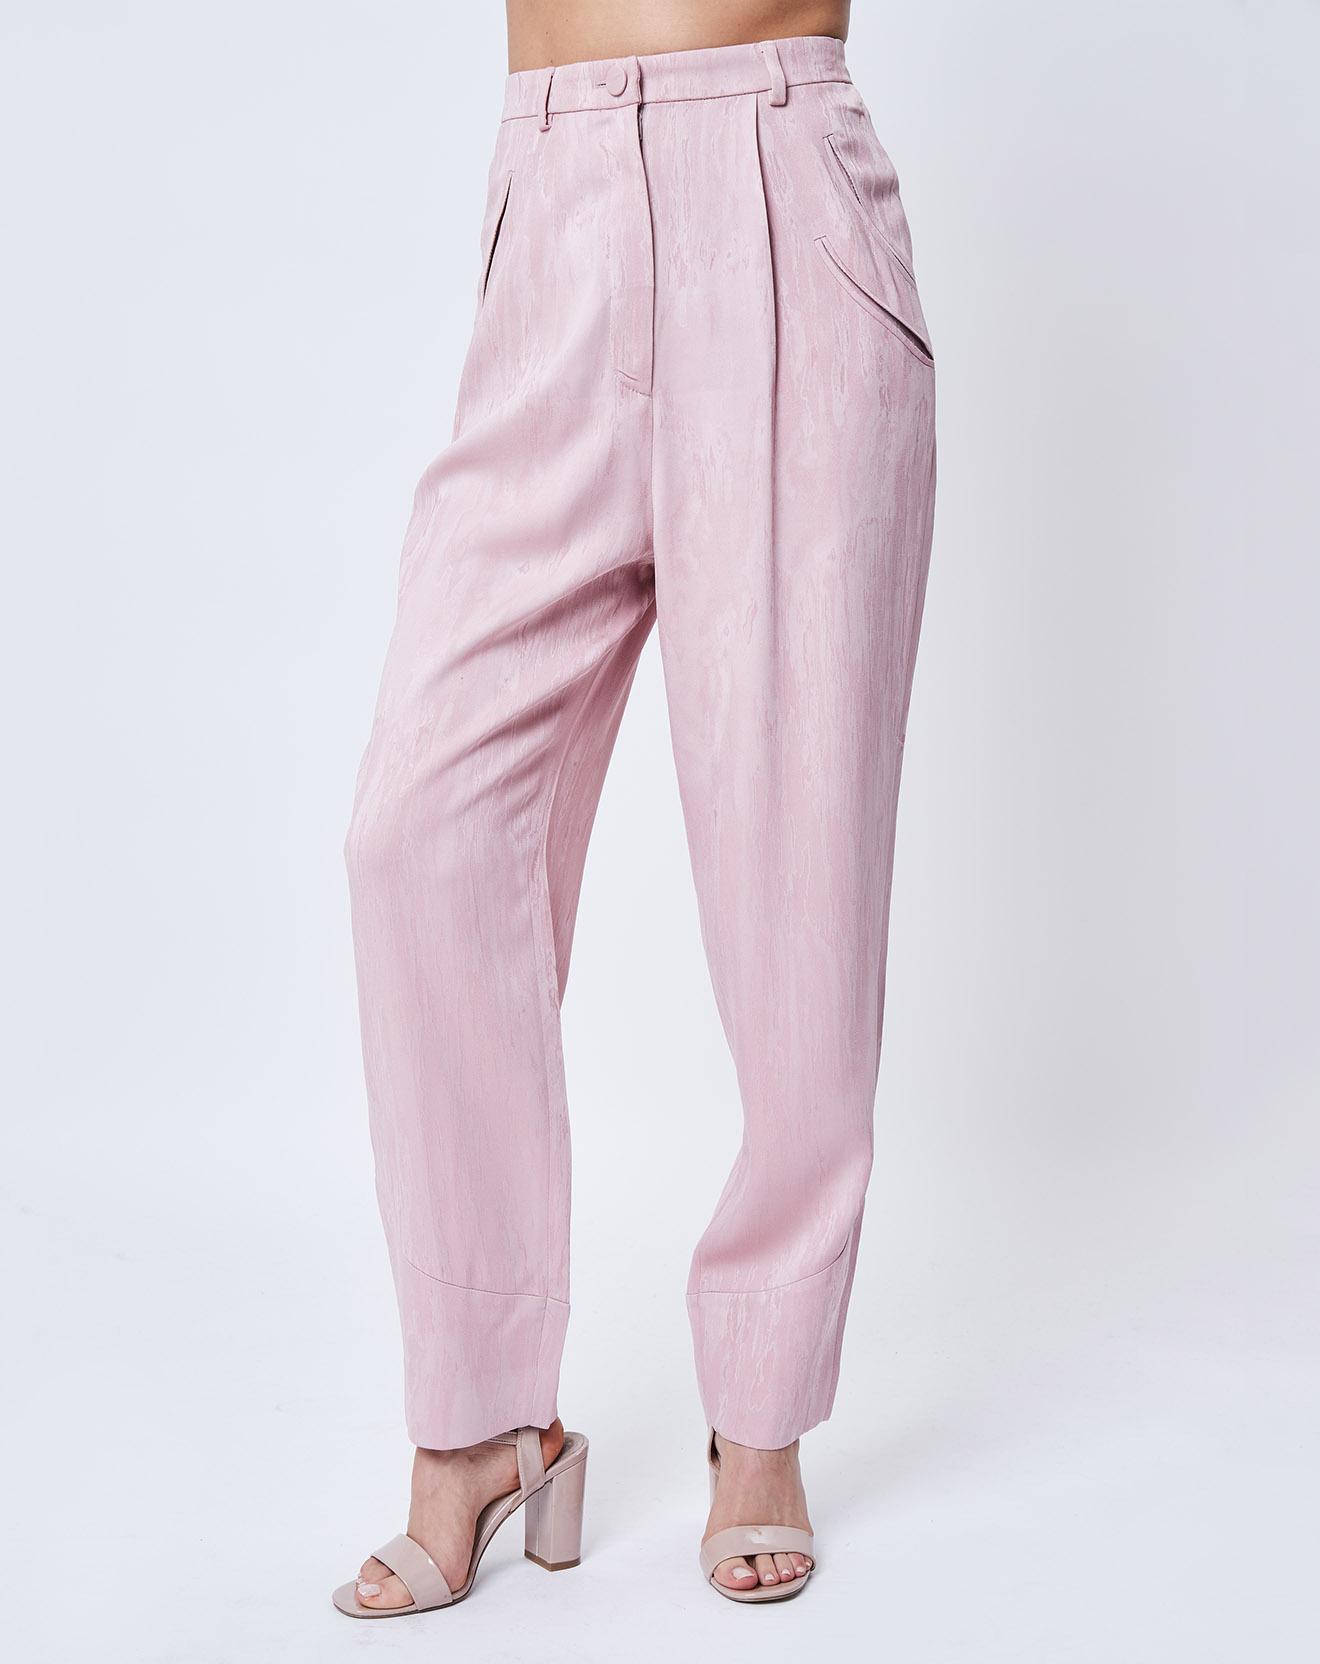 Pantalon fluide rose pâle - John Galliano - Modalova